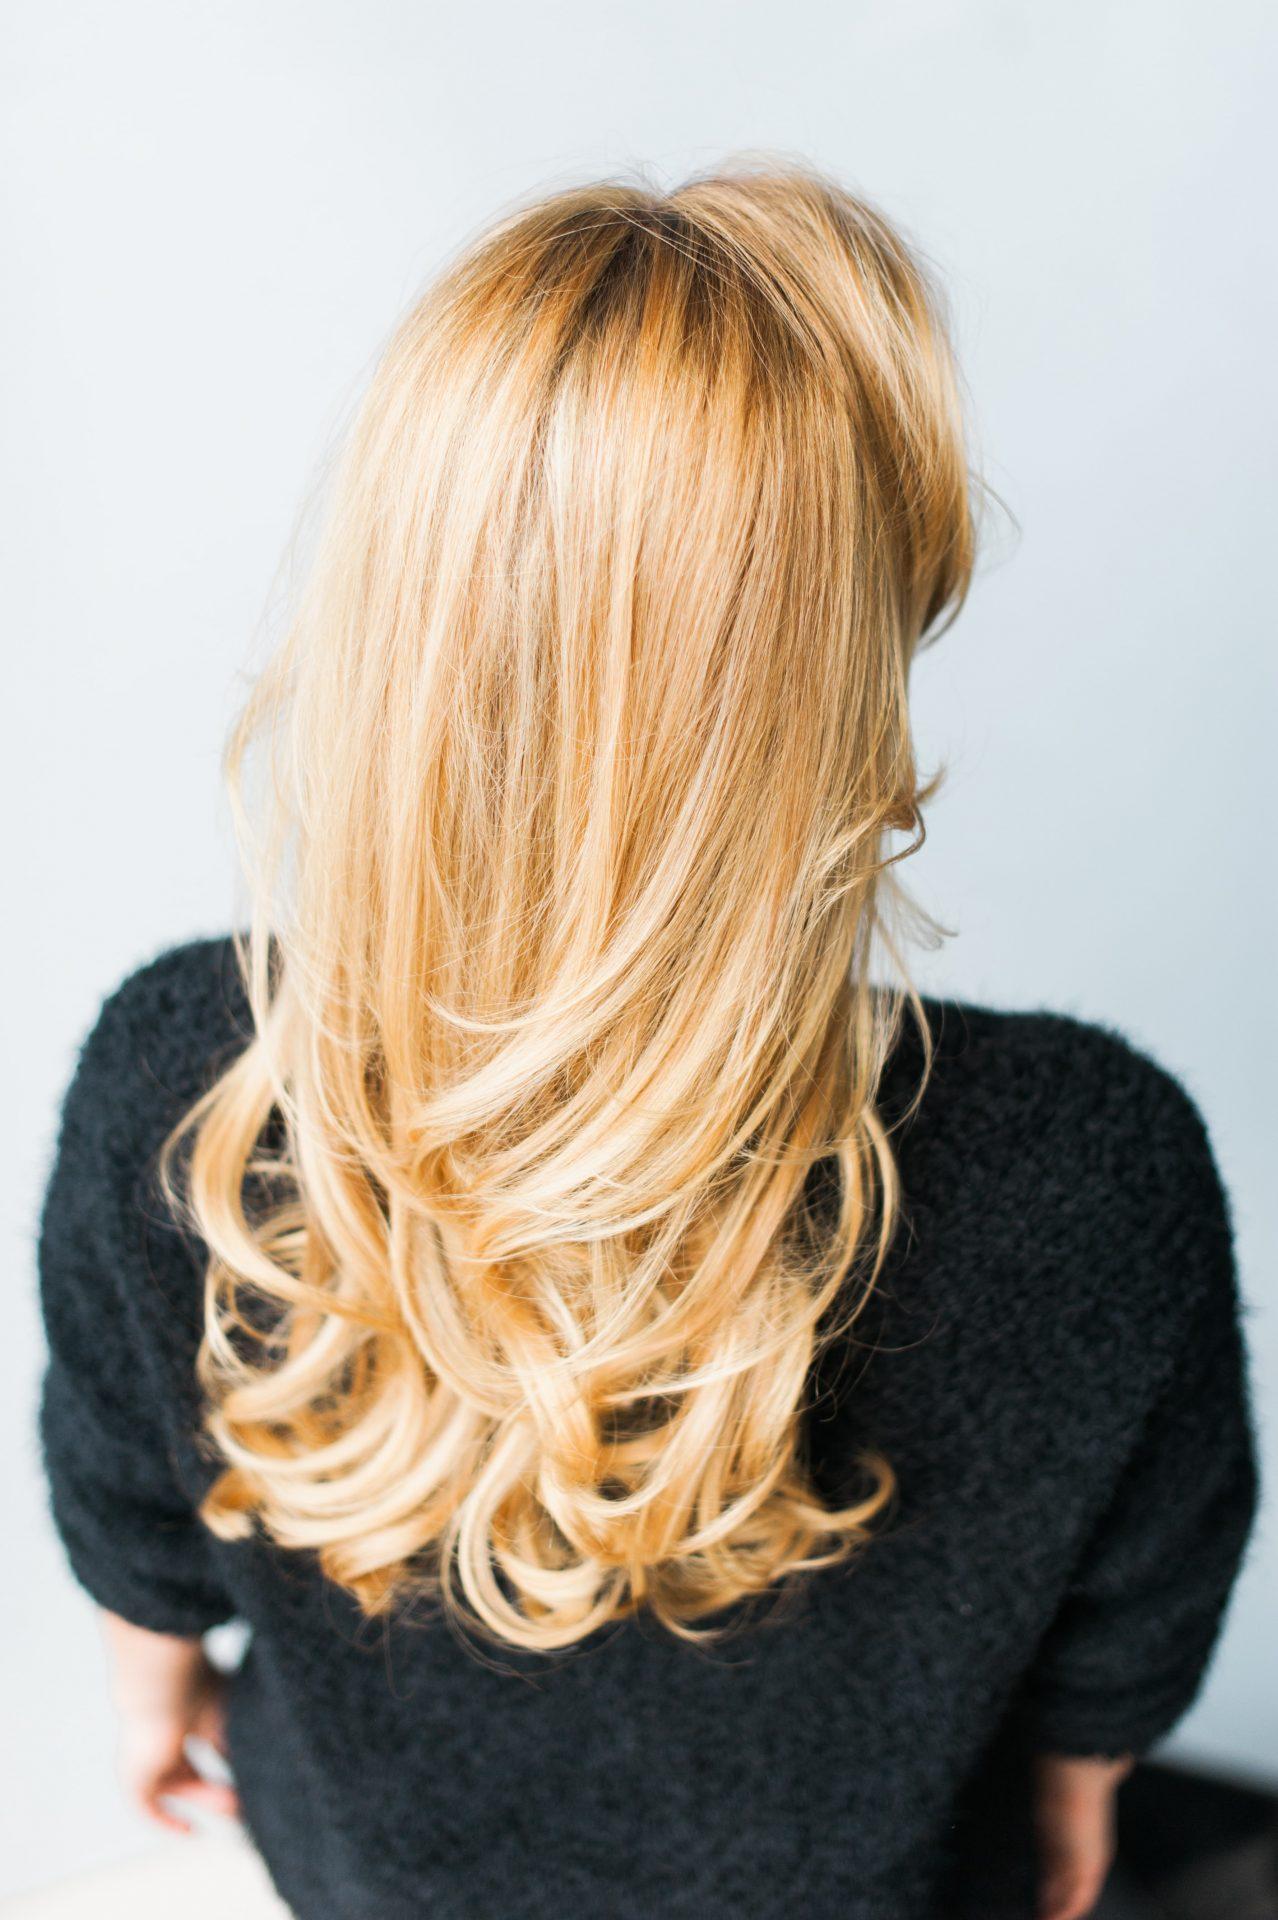 Kate Nielen's long hair